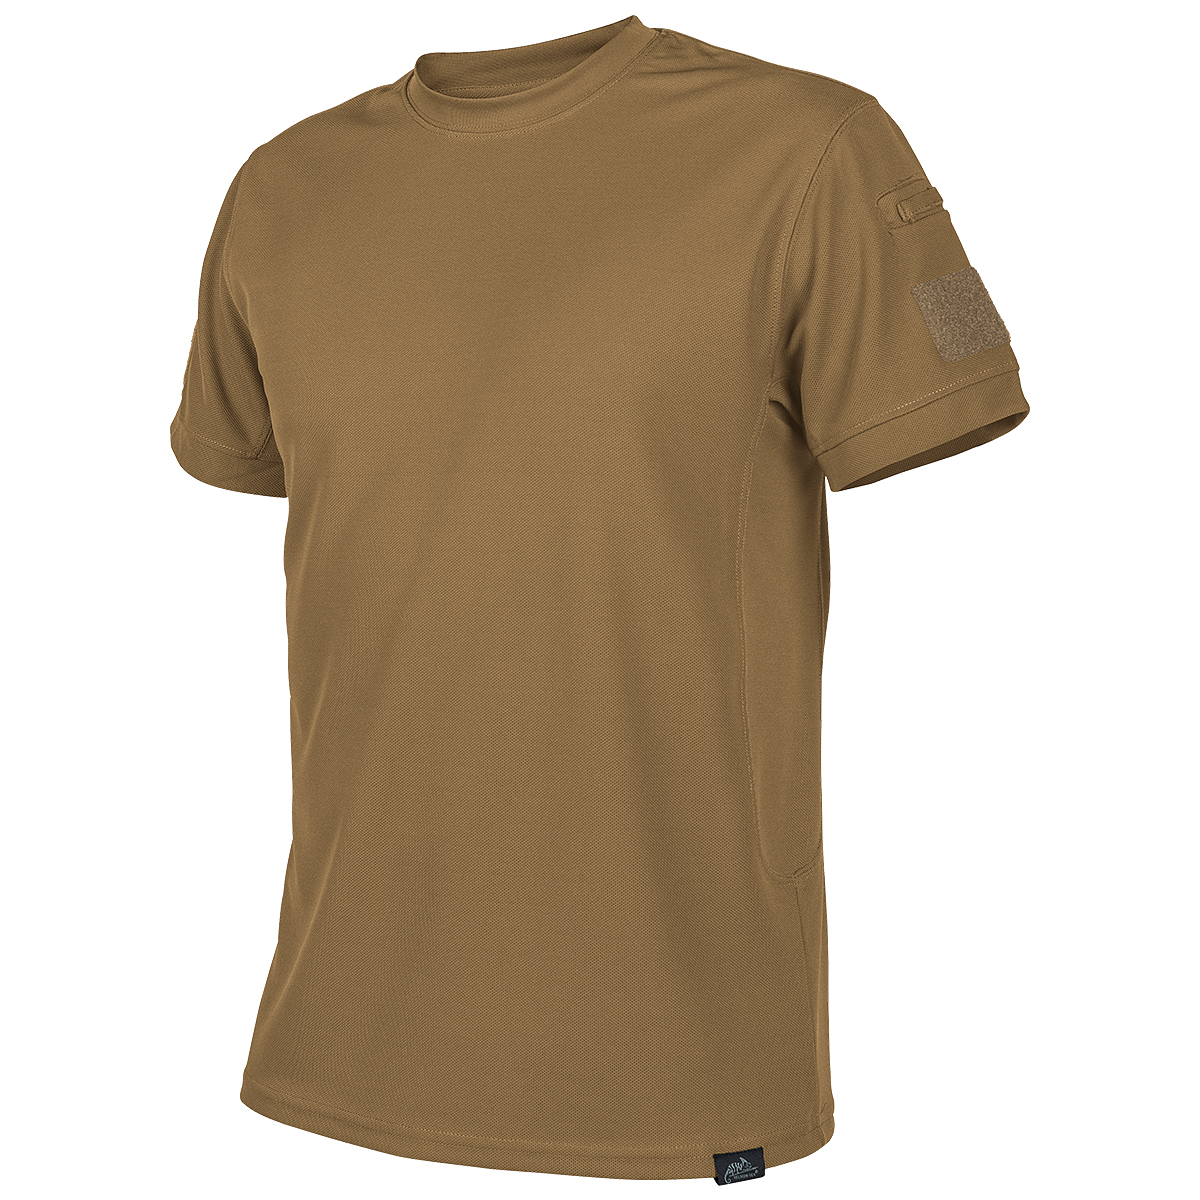 Helikon tactical t shirt coyote t shirts vests for Ez custom t shirts